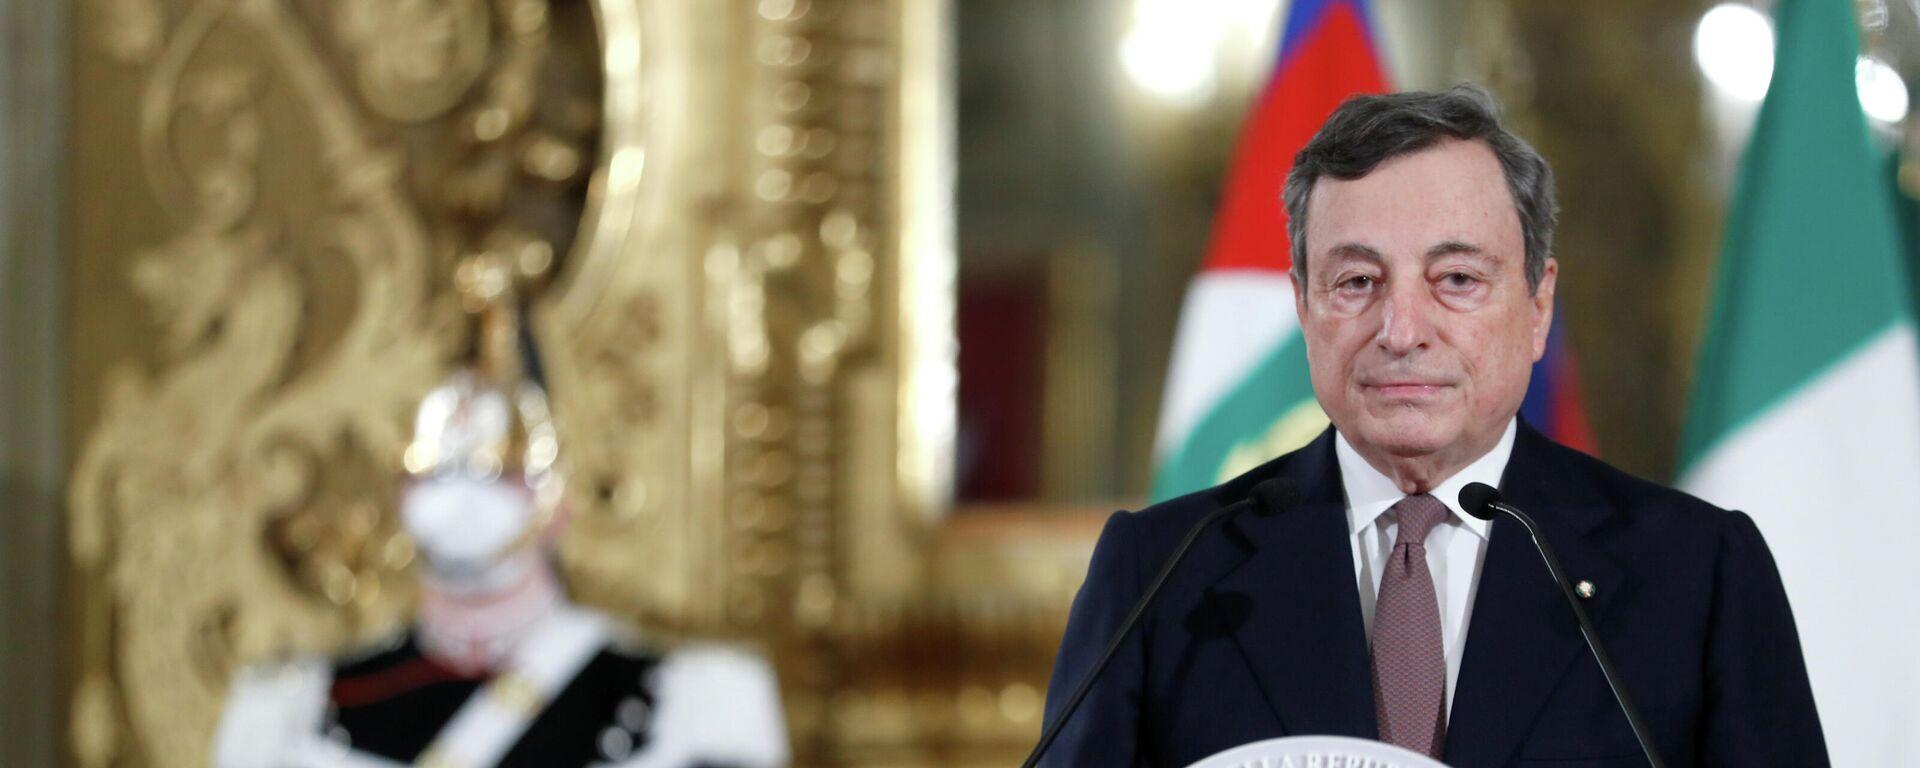 Mario Draghi, primer ministro de Italia - Sputnik Mundo, 1920, 15.02.2021